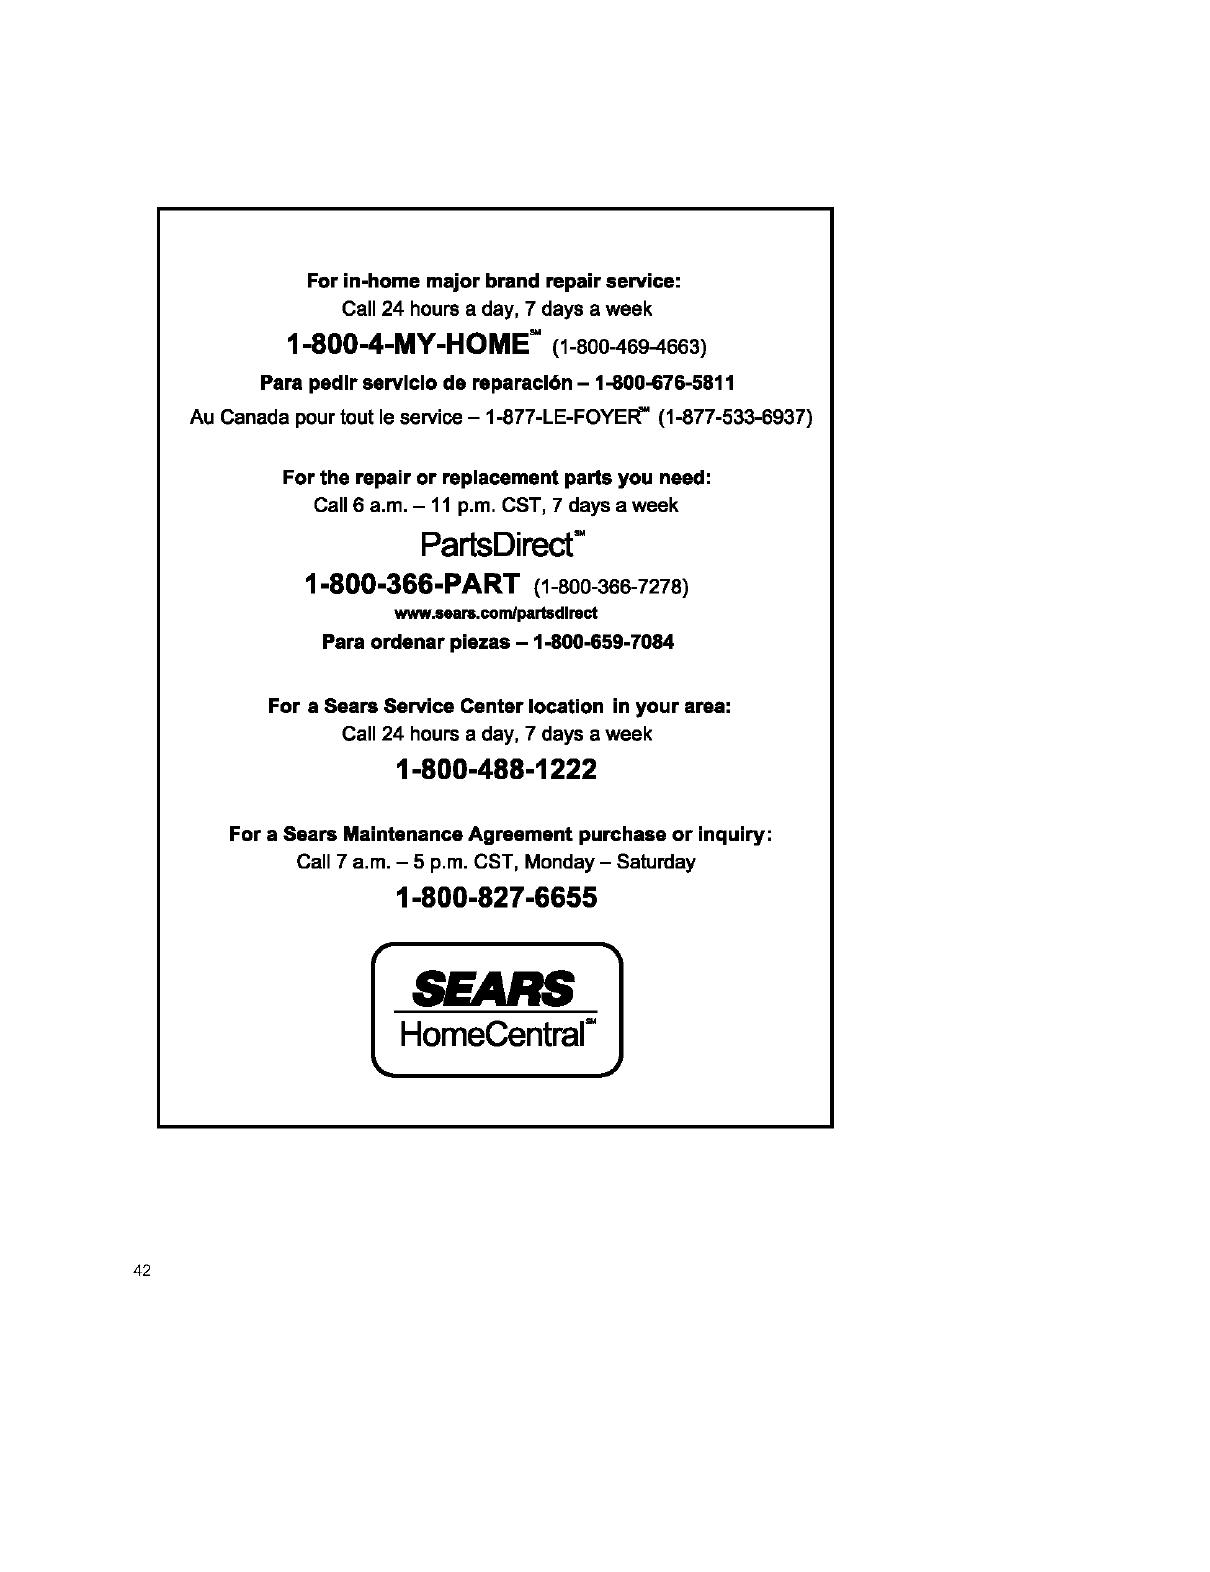 Sears maintenance agreements phone number the best agreement of 2018 sears maintenance agreements agreement lovely craftsman garage door platinumwayz